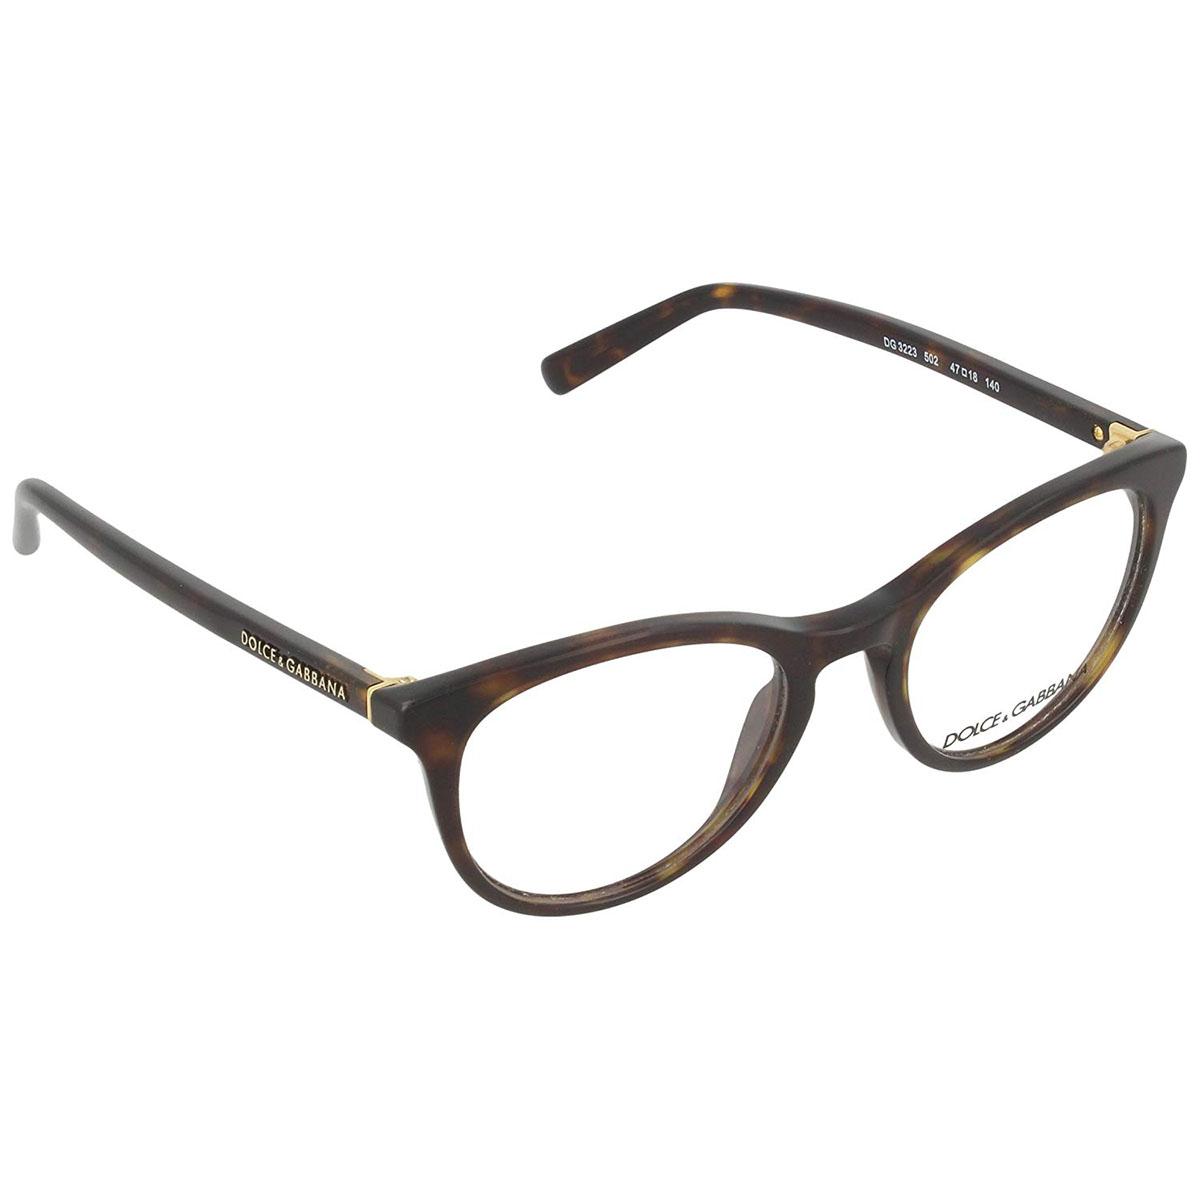 426b6cfd6745 Dolce   Gabbana DG 3223 502 Dark Havana Eyeglasses